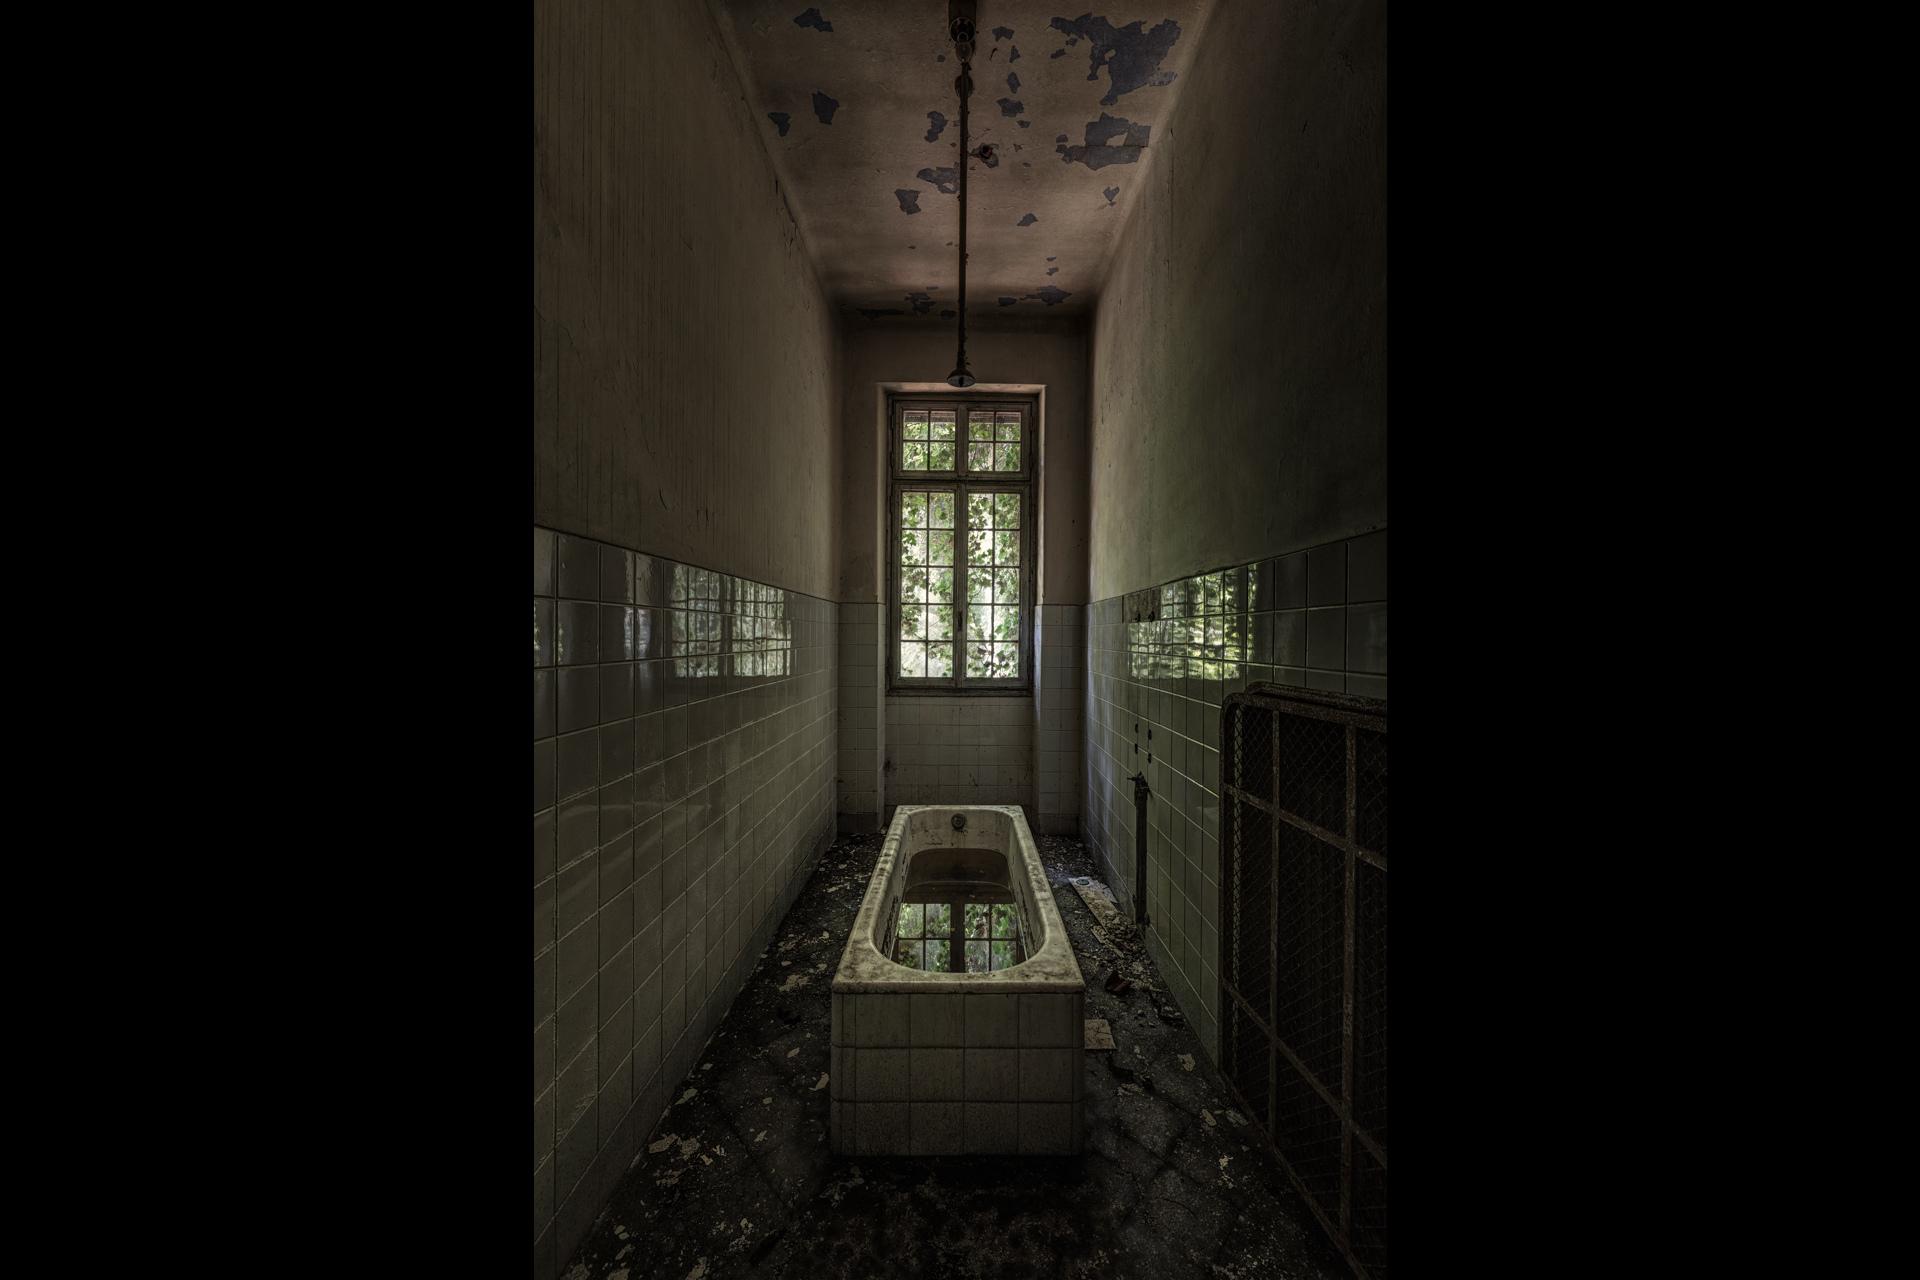 Urban Exploration - Manicomio Vendetta - What Lies Beneath